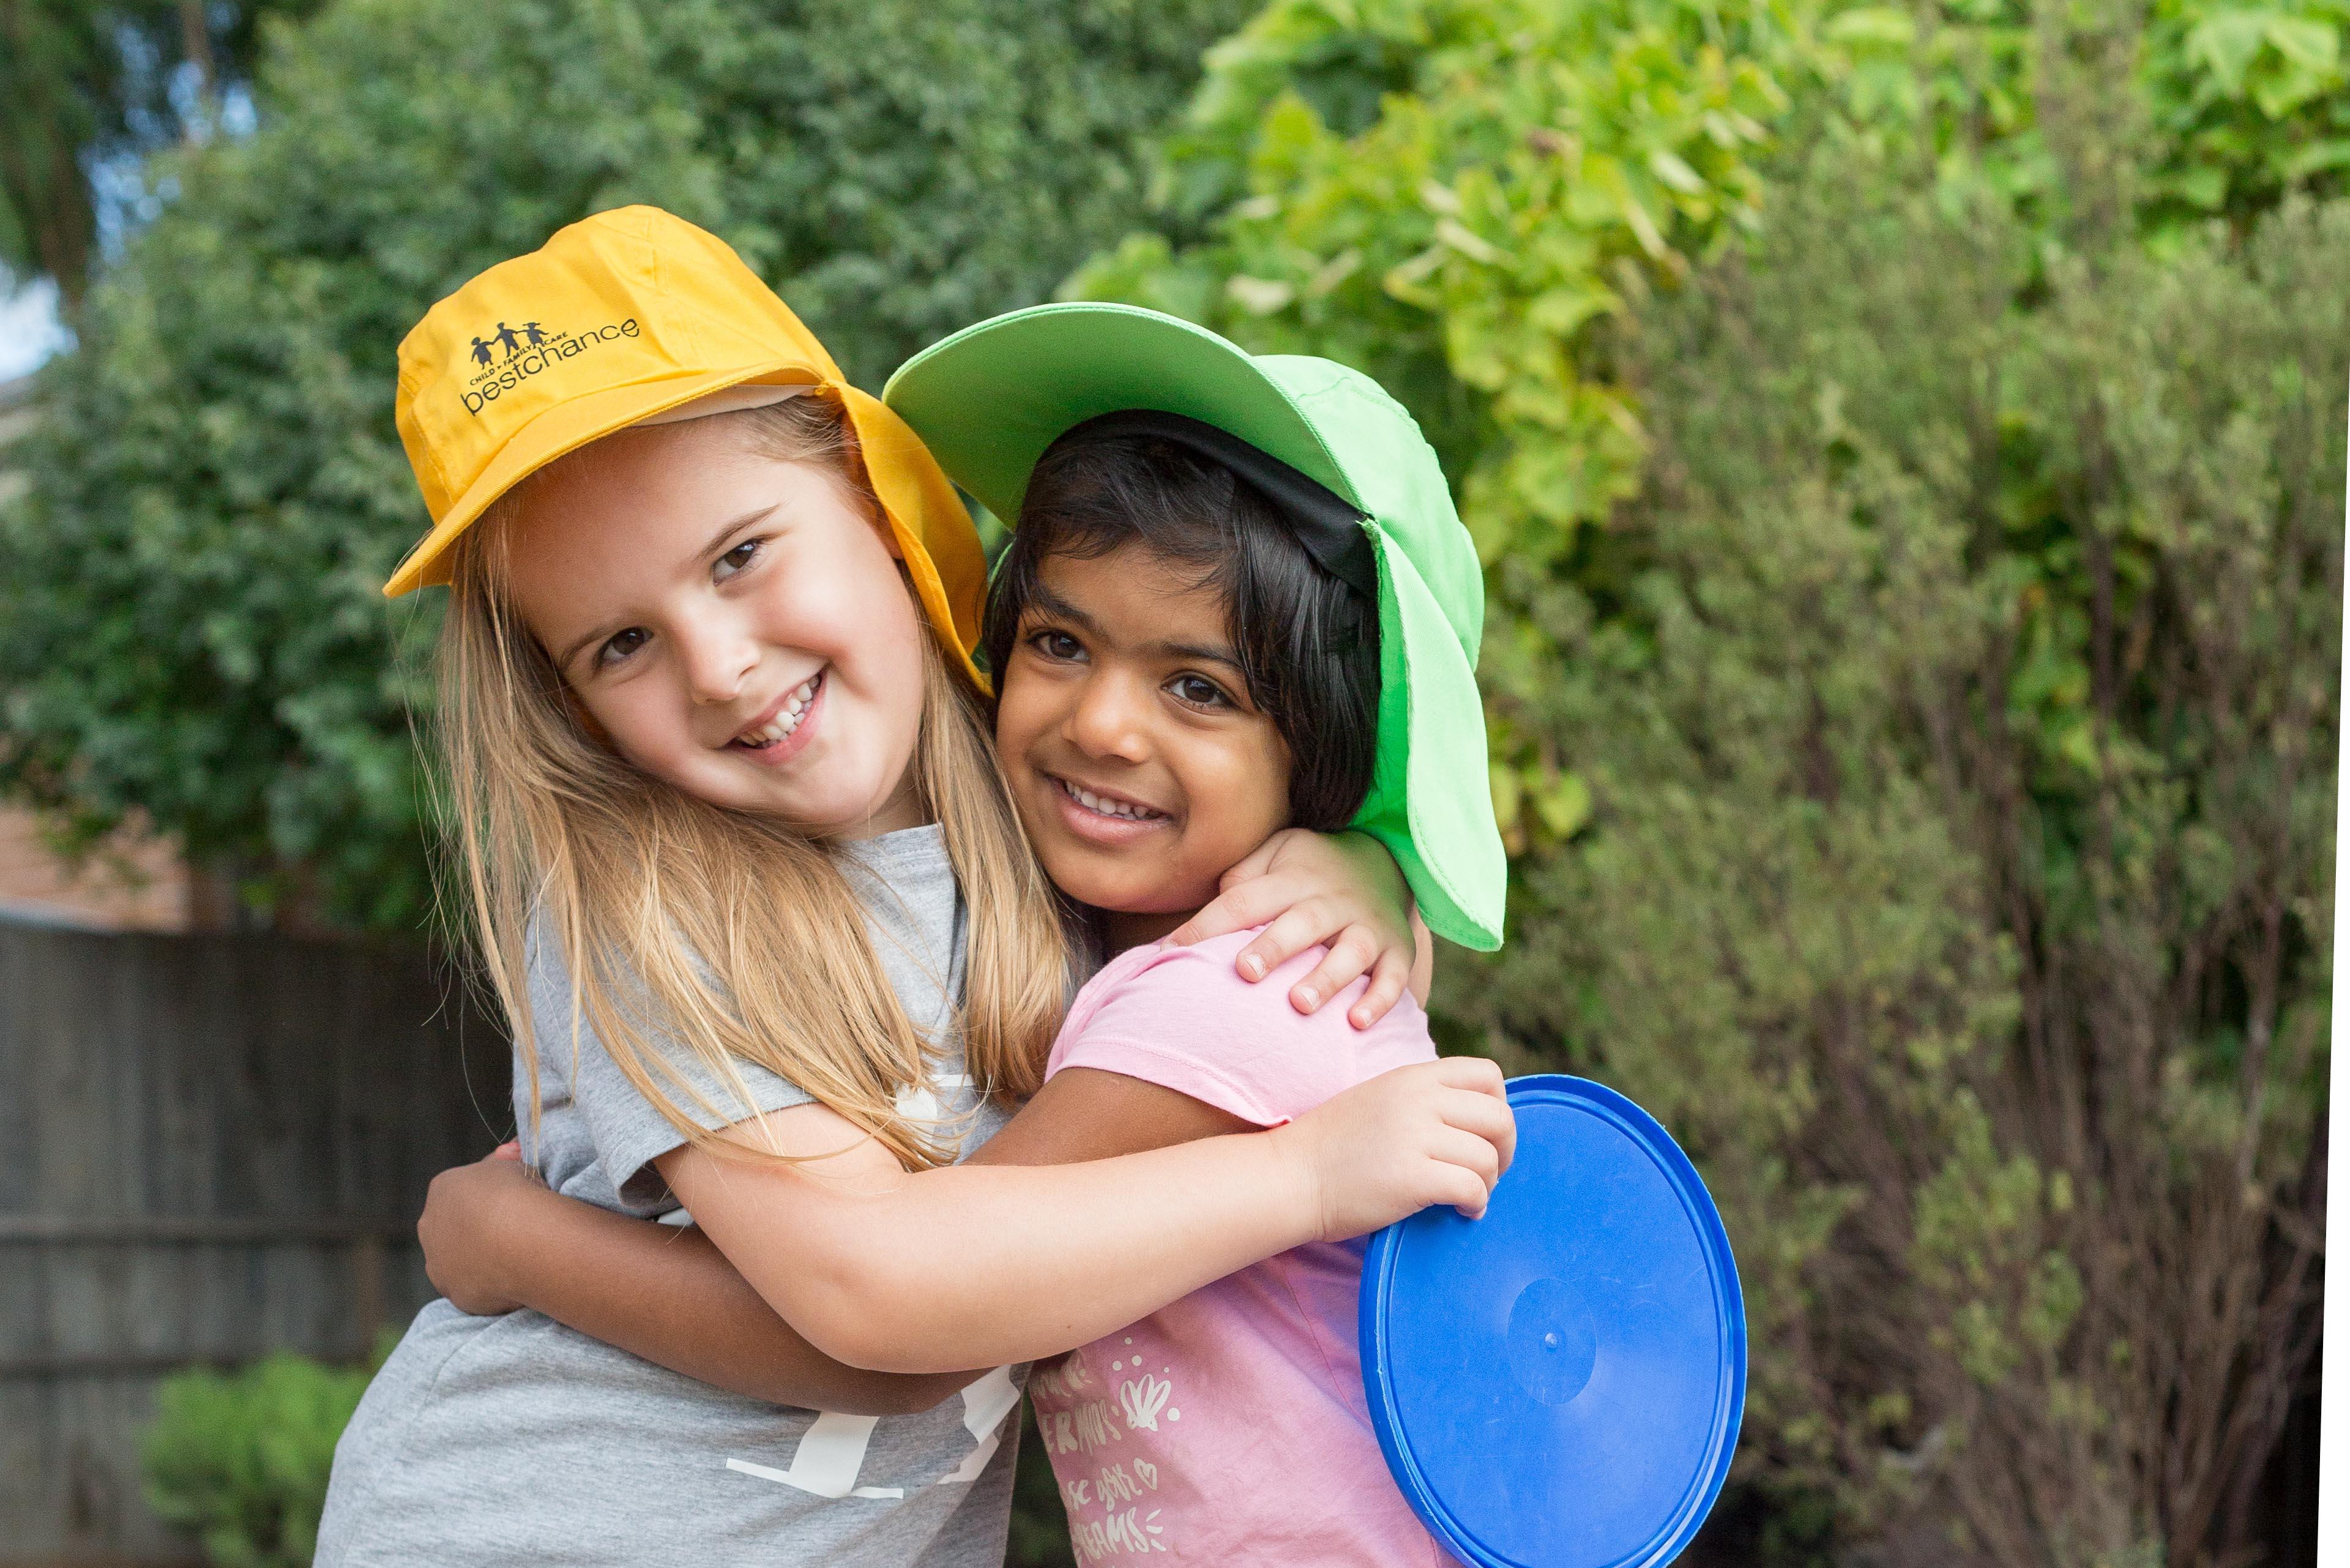 Noble Park Child Care Centre - bestchance Child Family Care